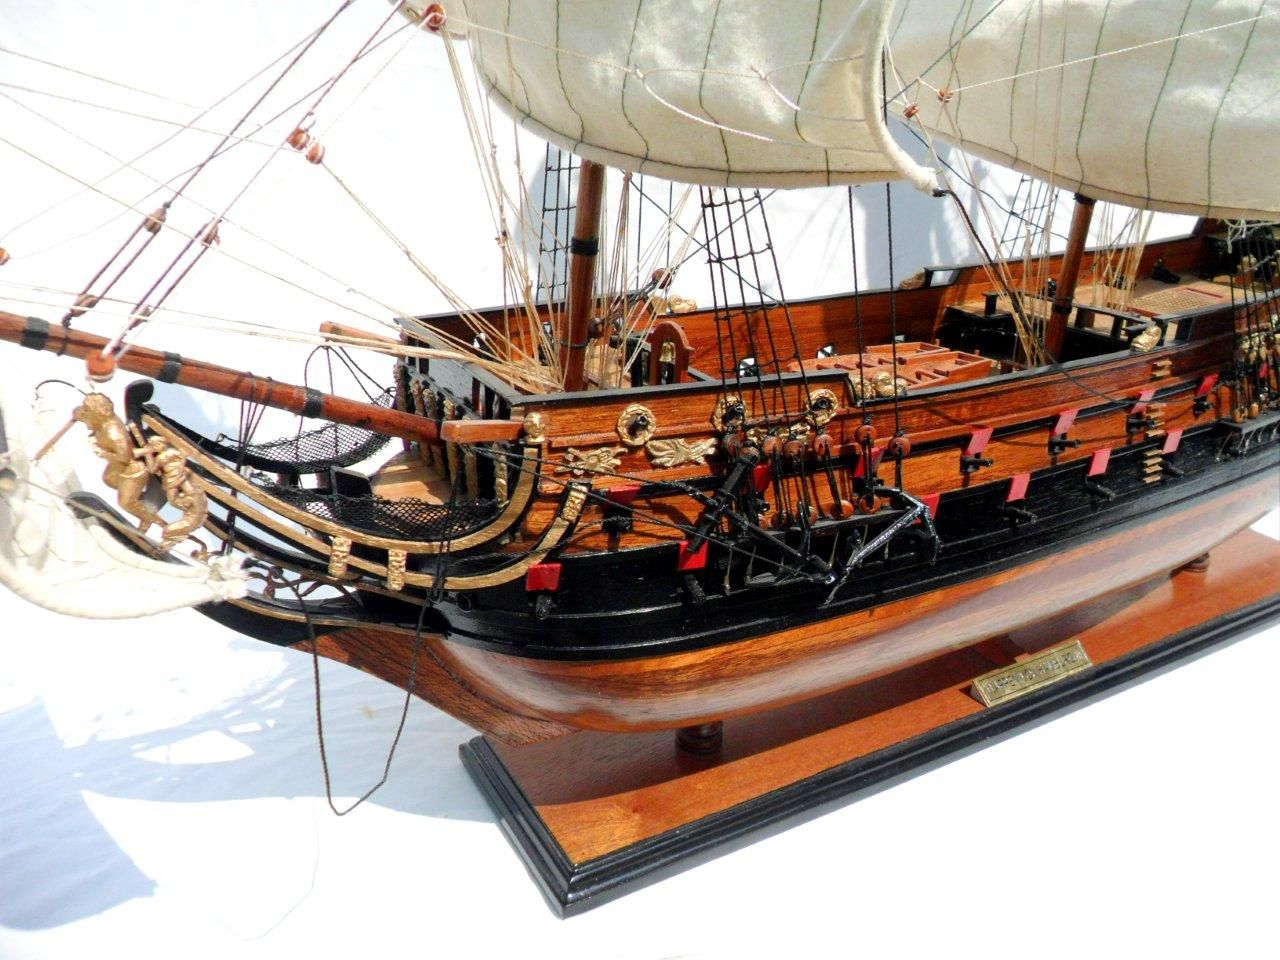 1996-12606-Wapen-von-Hamburg-III-Model-ship